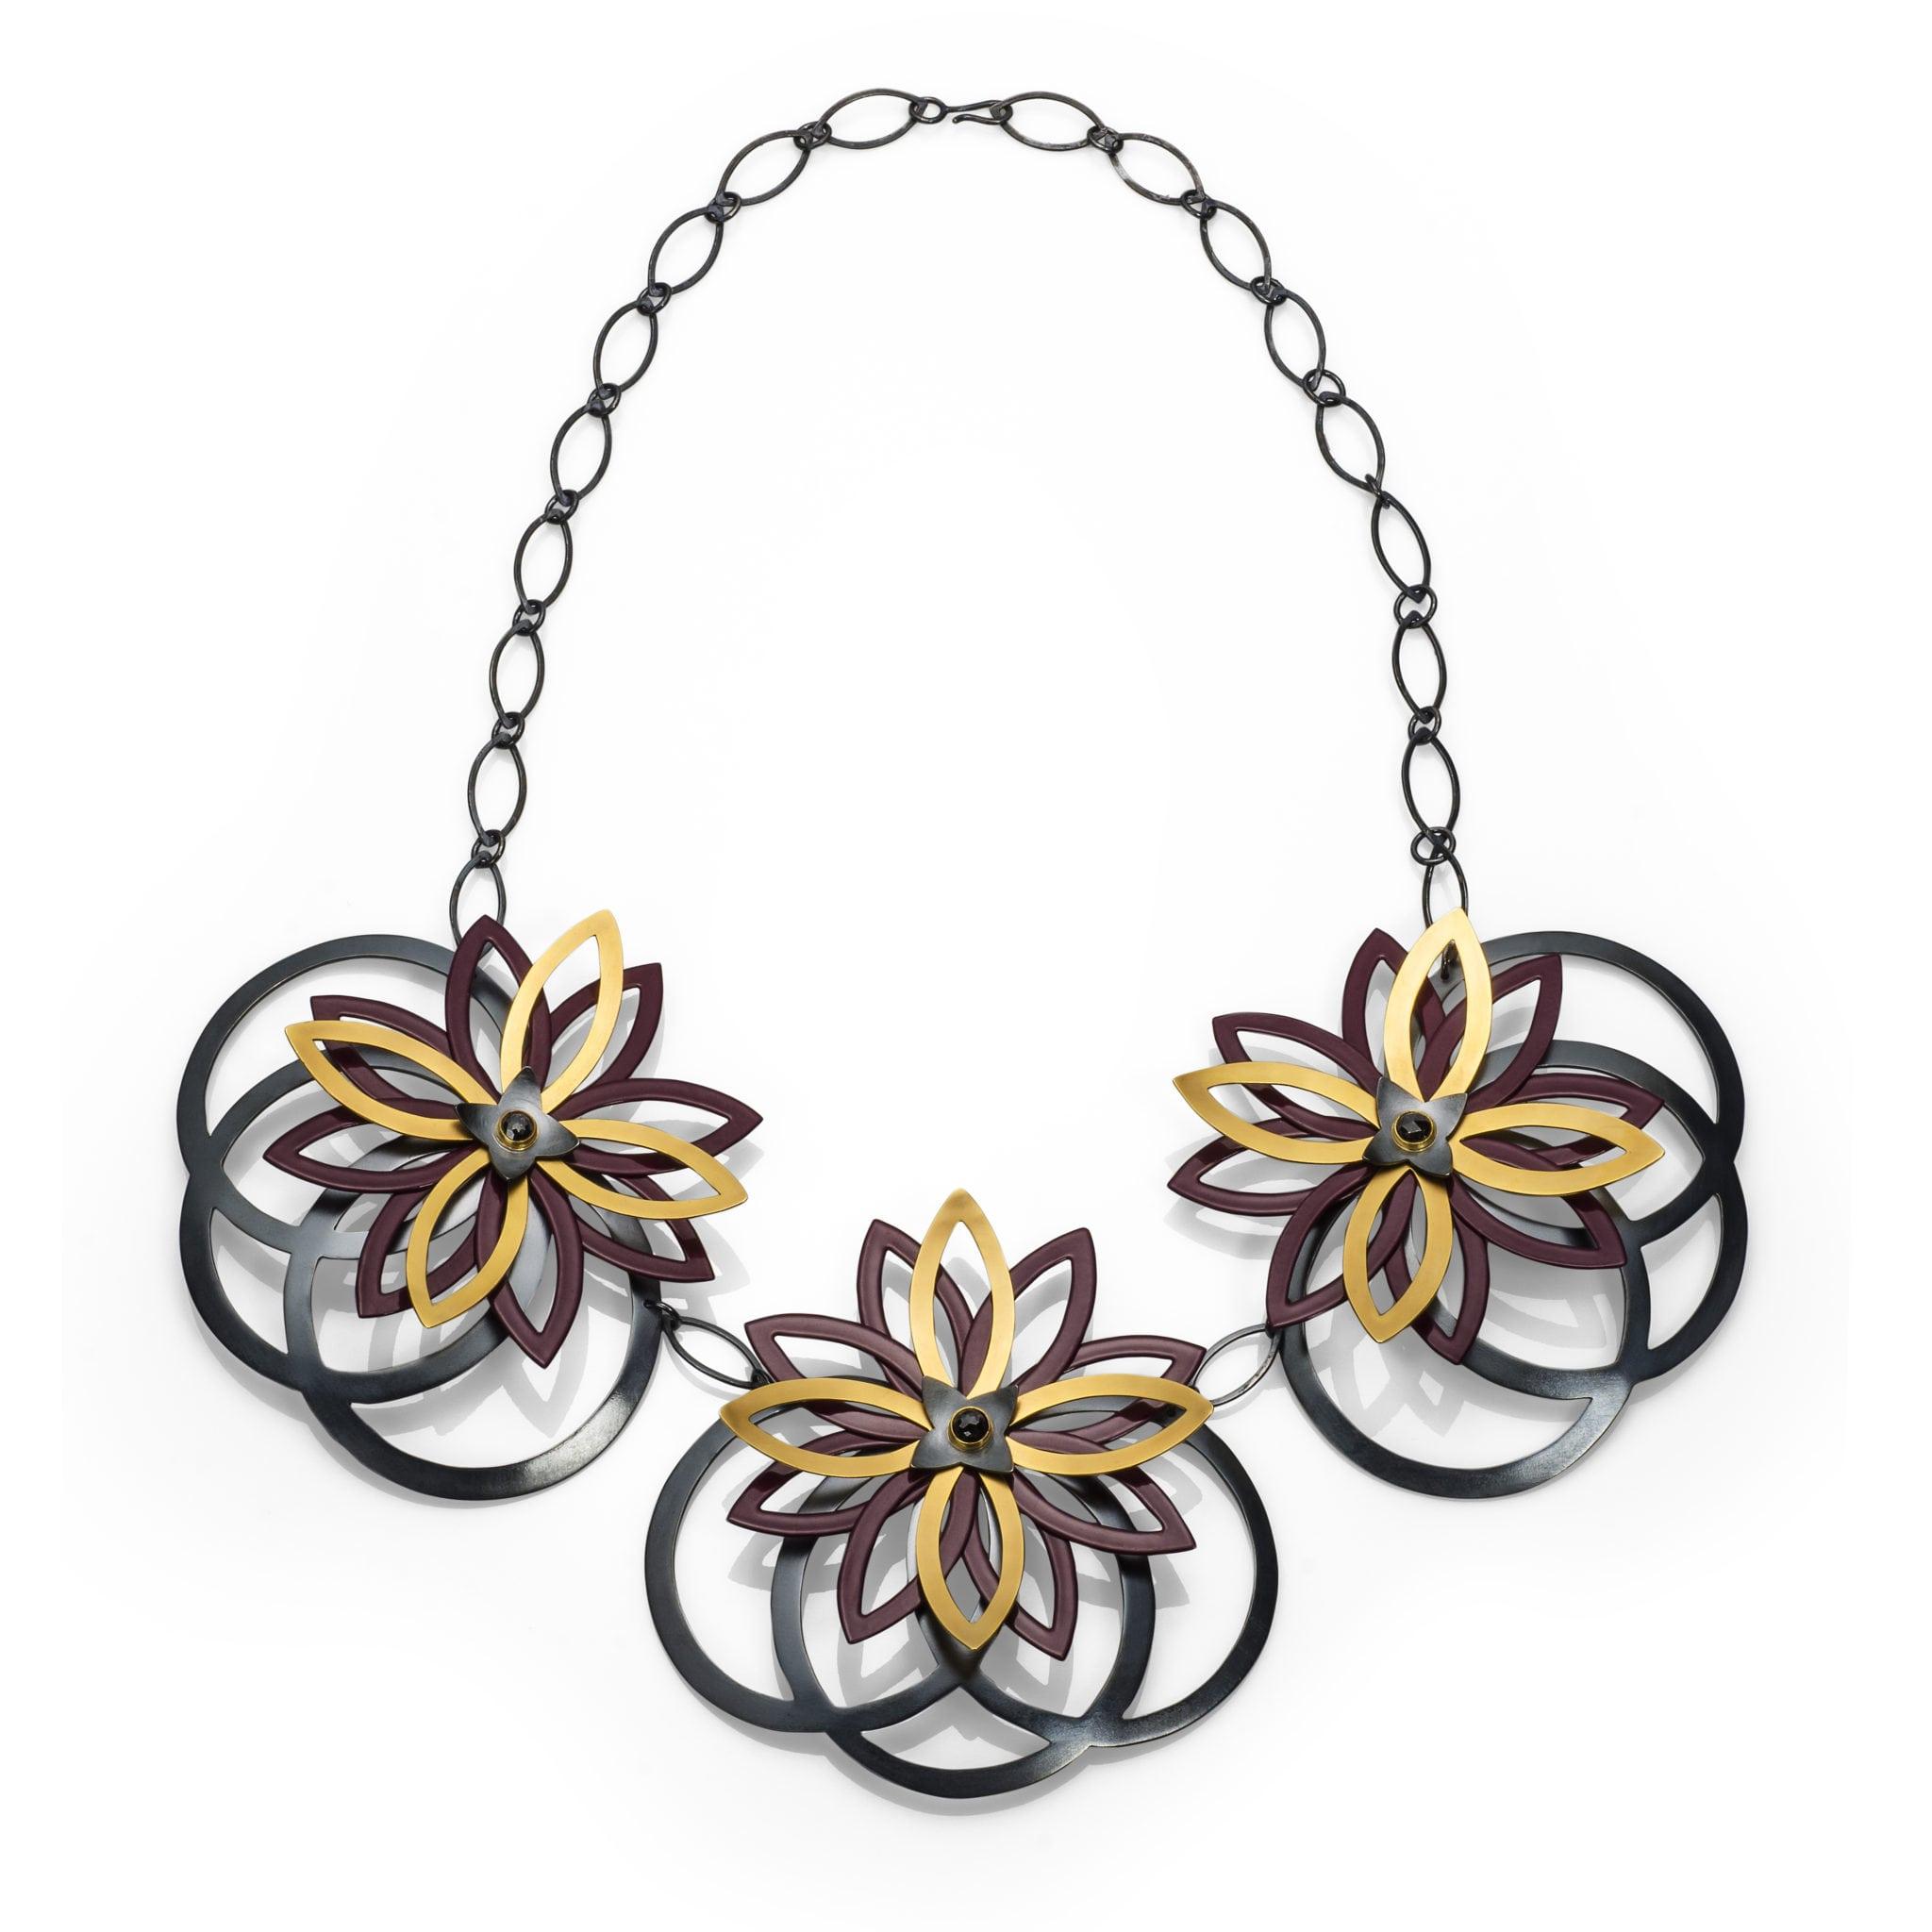 Berlian Arts Robert Diamante Jewelry Photography Web Design